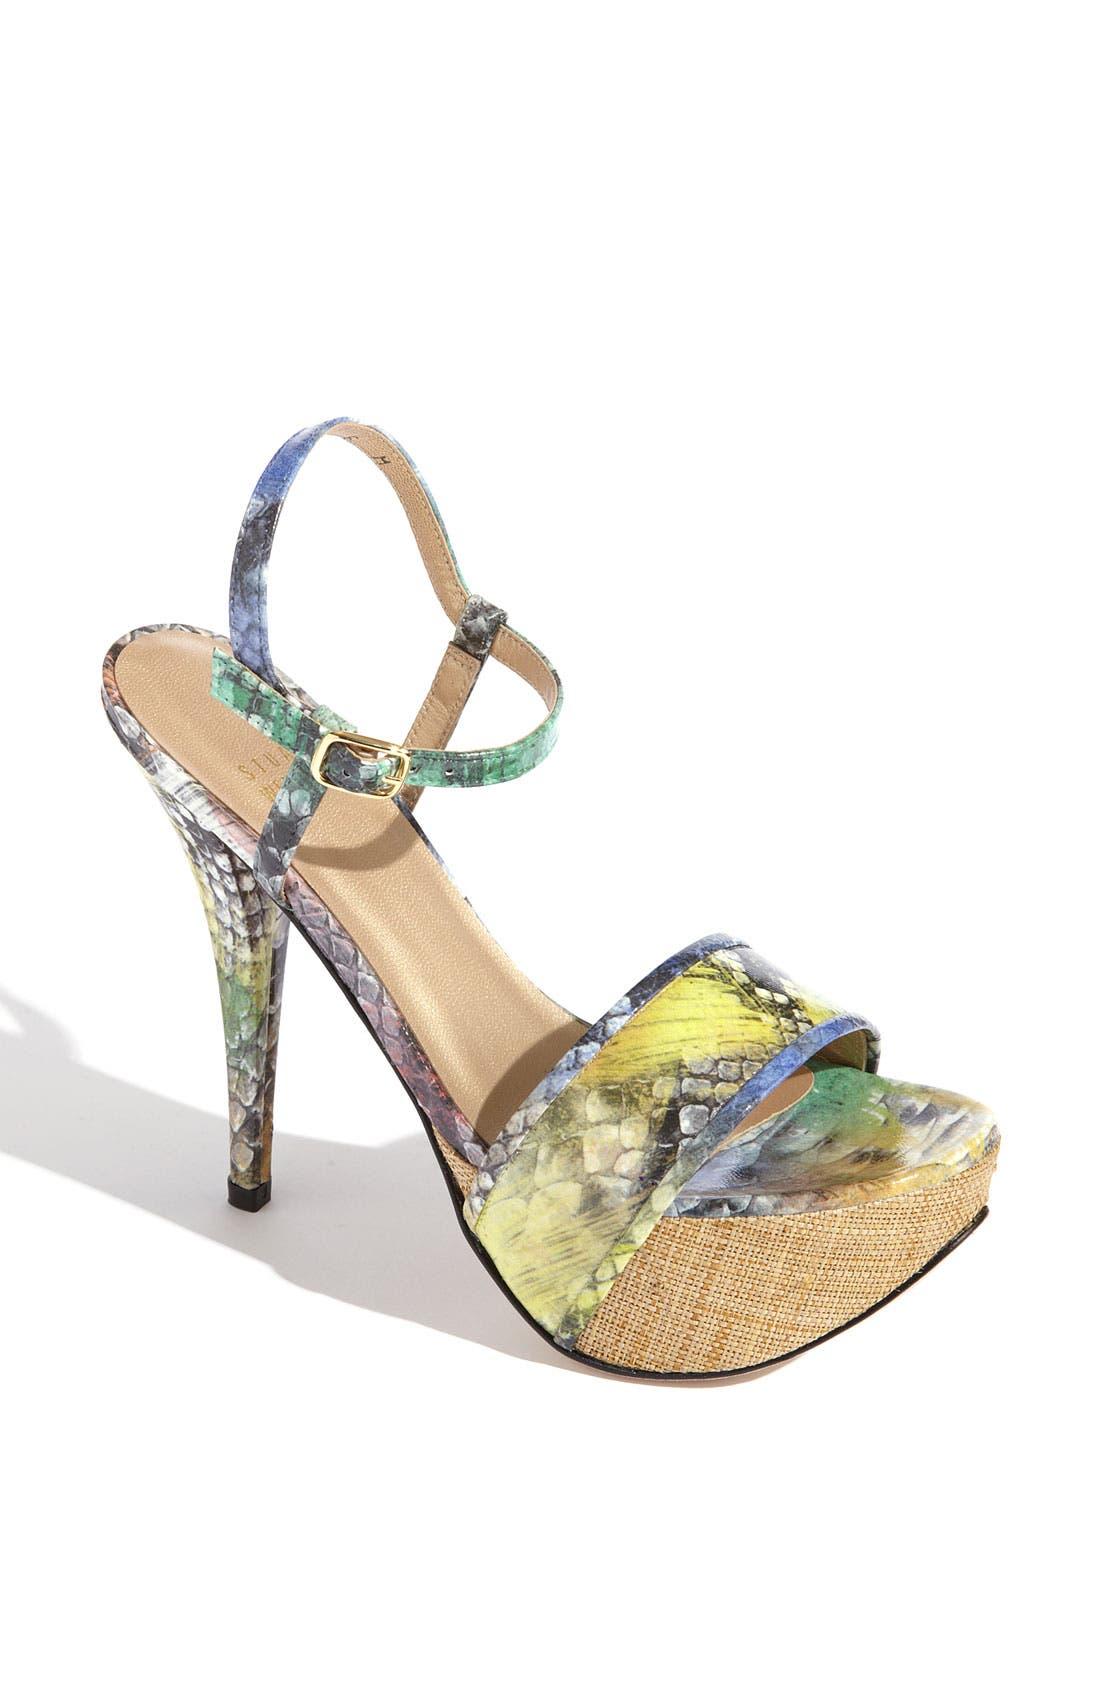 Alternate Image 1 Selected - Stuart Weitzman 'Onceover' High Heel Sandal